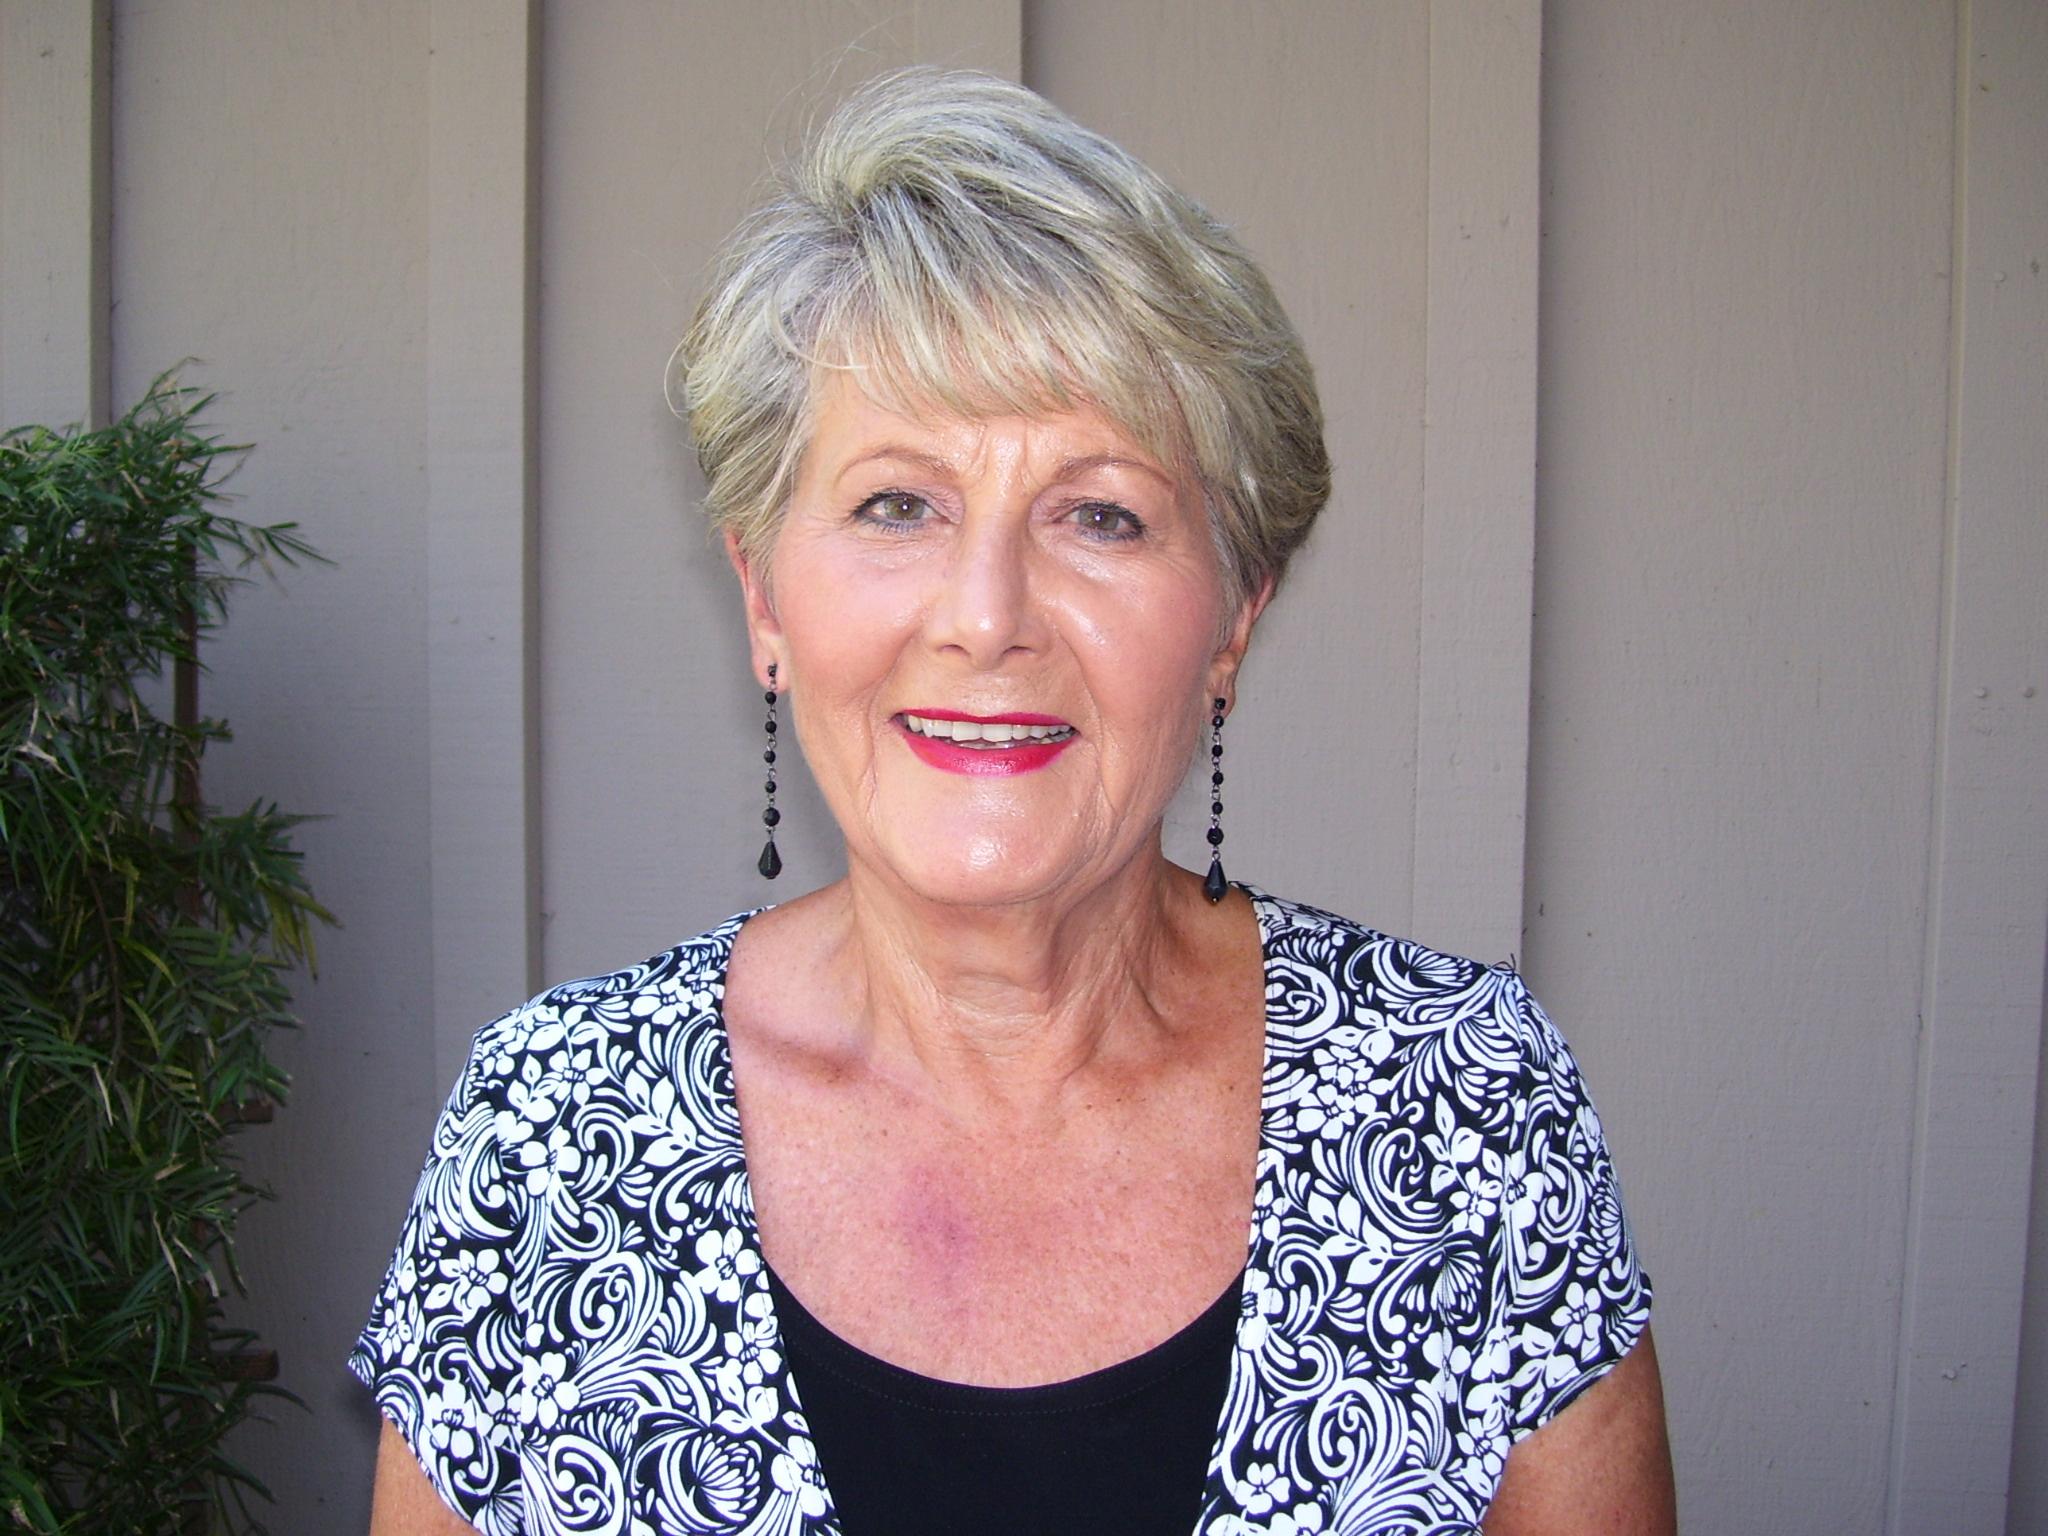 Joan Robillard